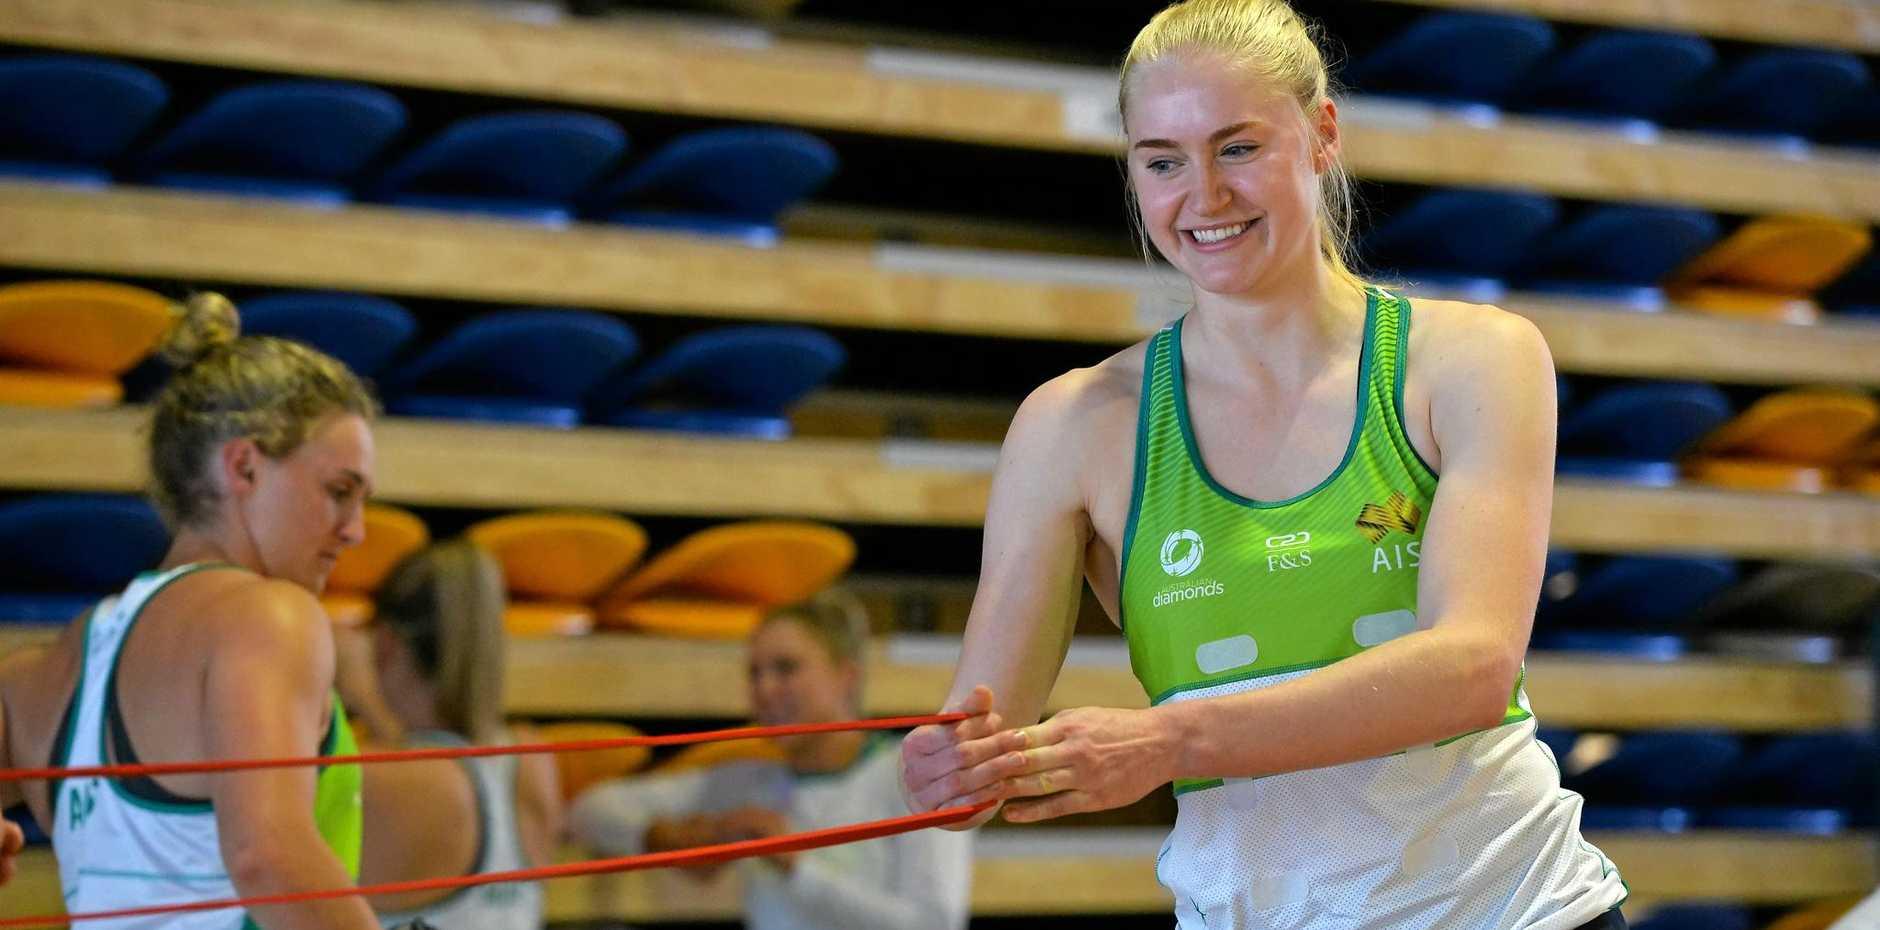 MAIN PLAYER: Australian Diamonds defender Jo Weston trains at the University of the Sunshine Coast.